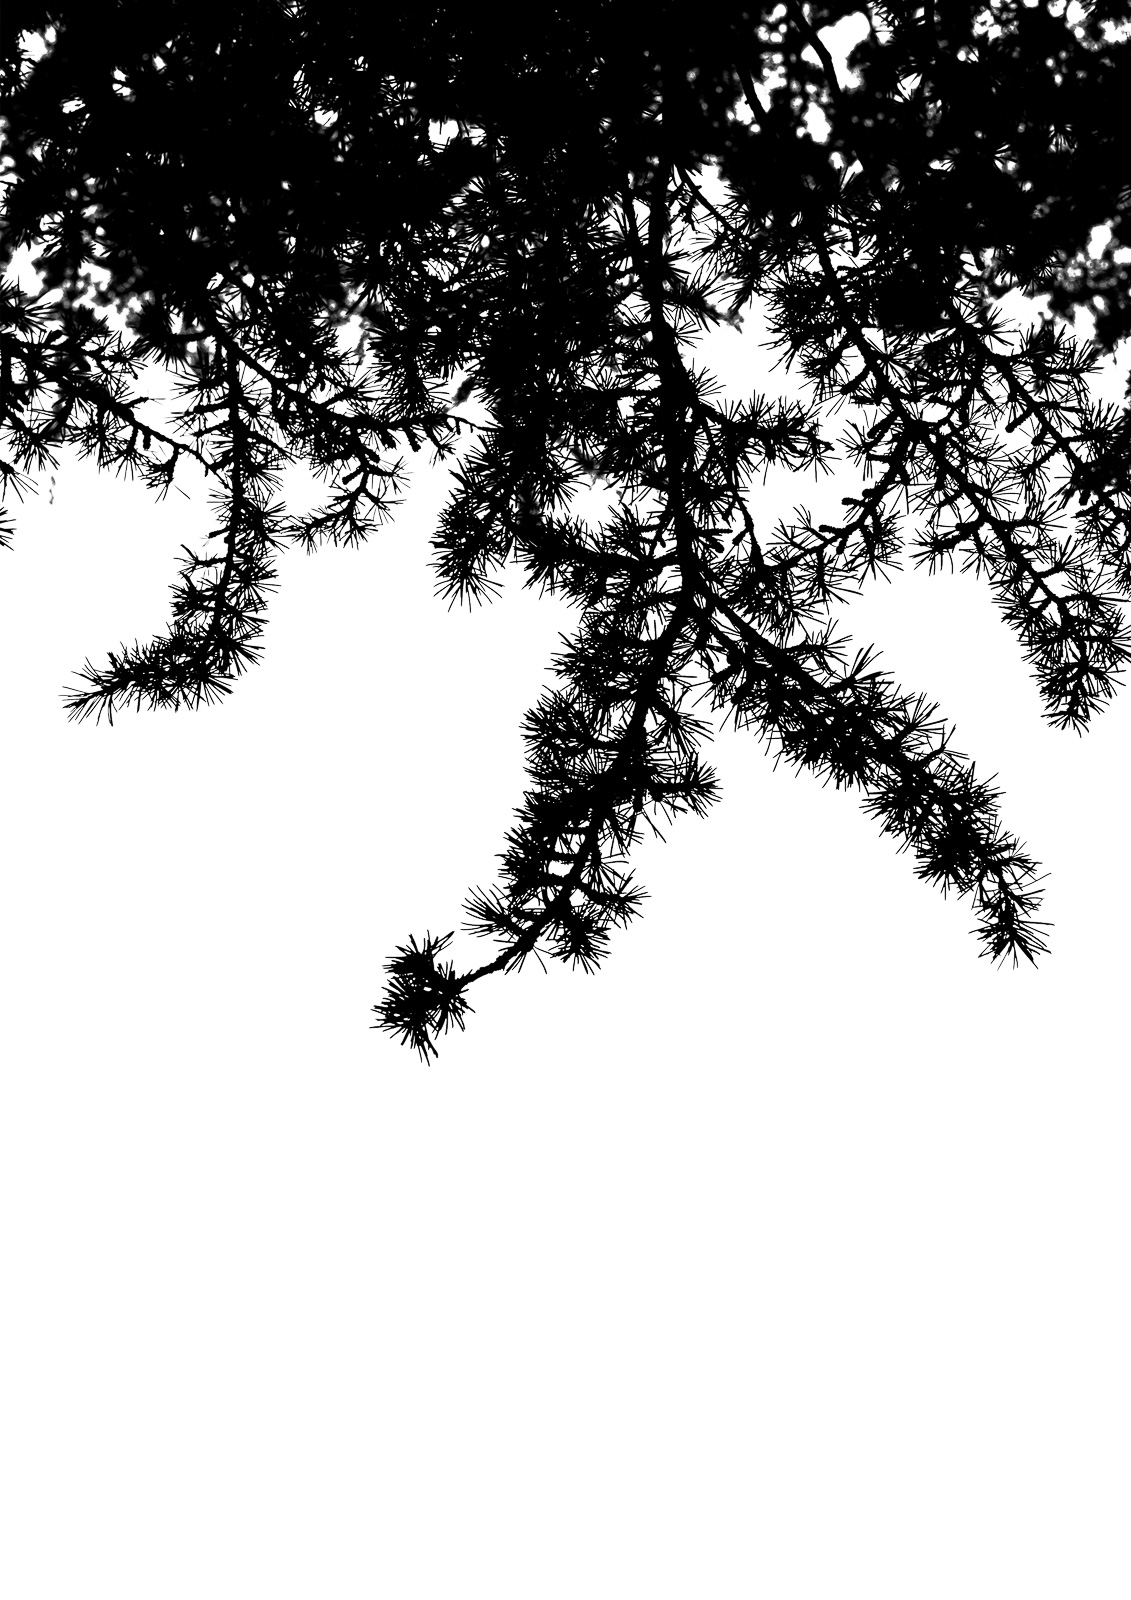 Casali - Les branches - Les pins